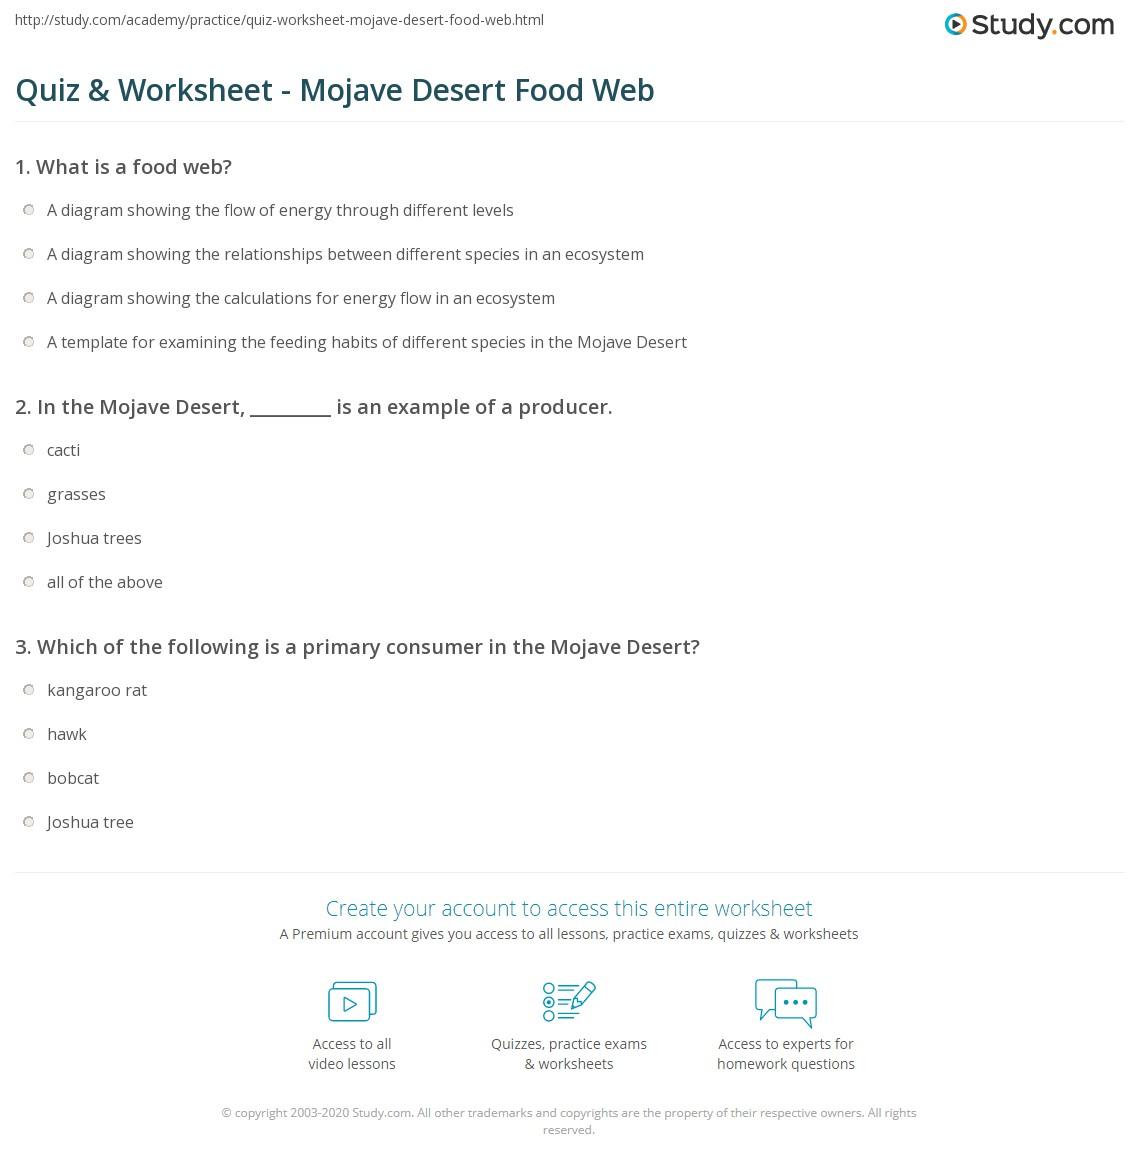 Worksheet Place Desert : Quiz worksheet mojave desert food web study